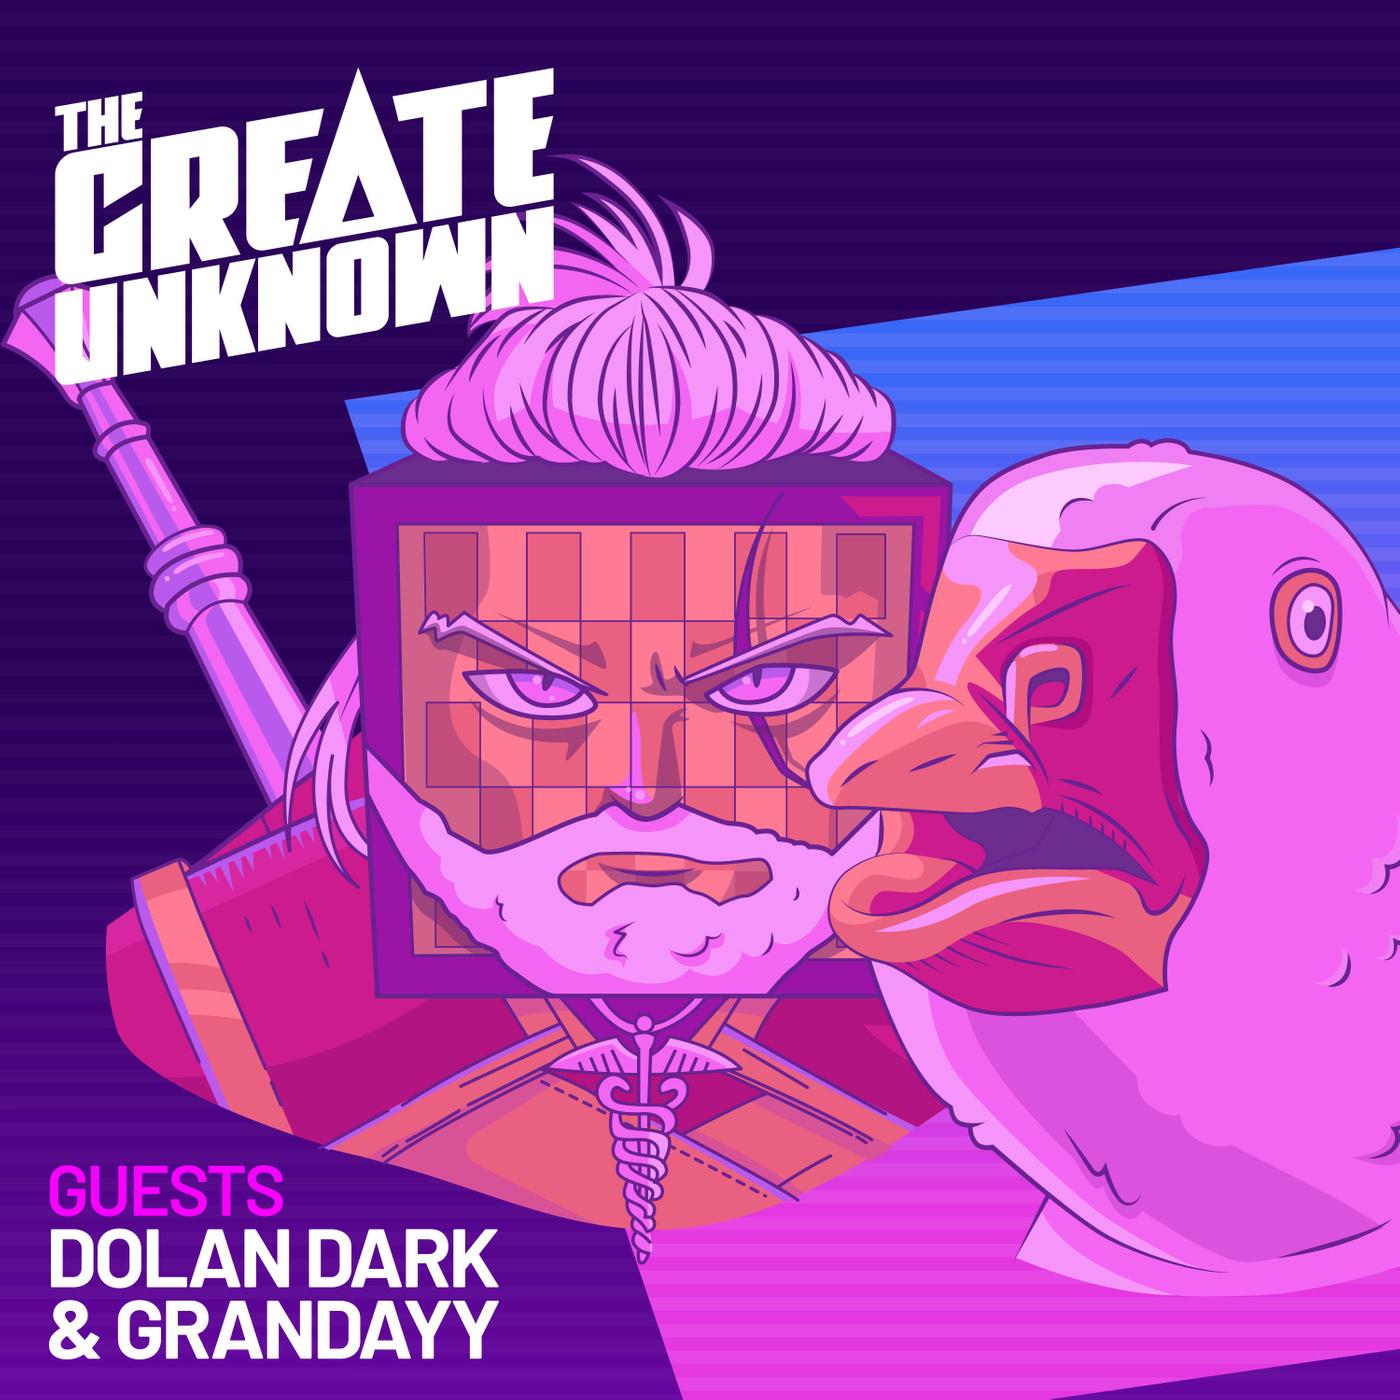 Meme-ing a Living with Dolan Dark & Grandayy